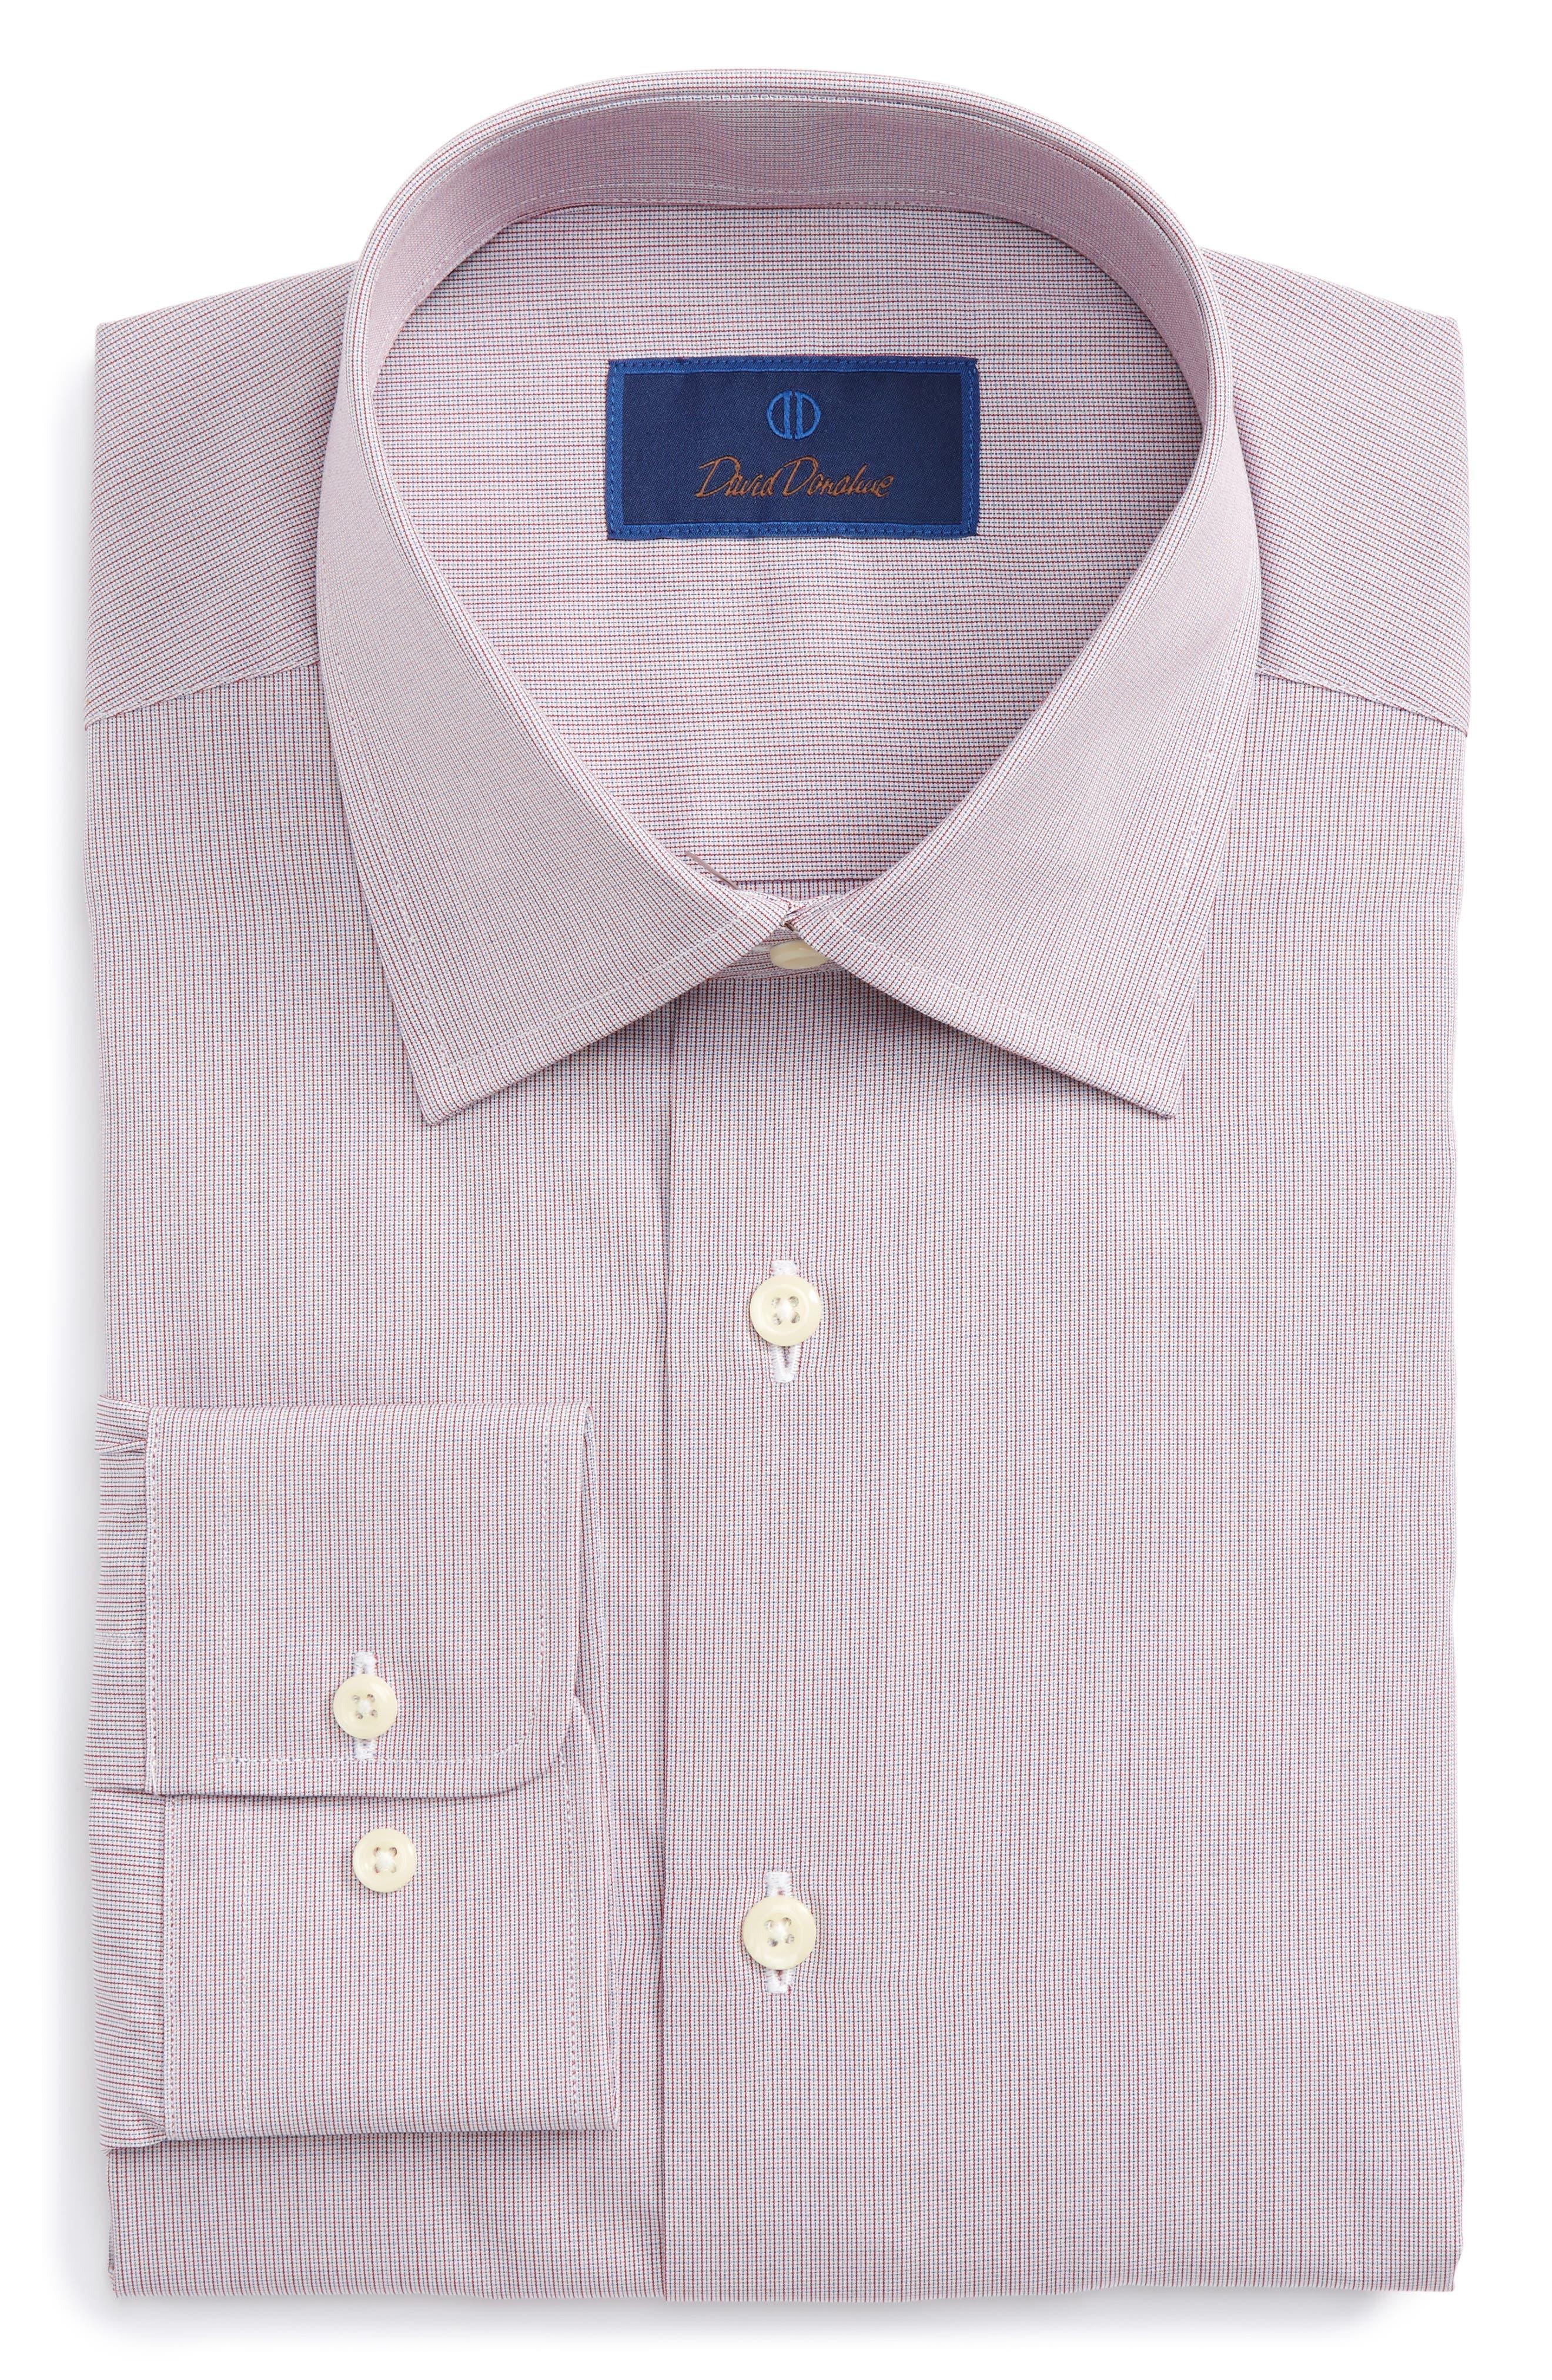 Regular Fit Check Dress Shirt,                             Main thumbnail 1, color,                             Merlot